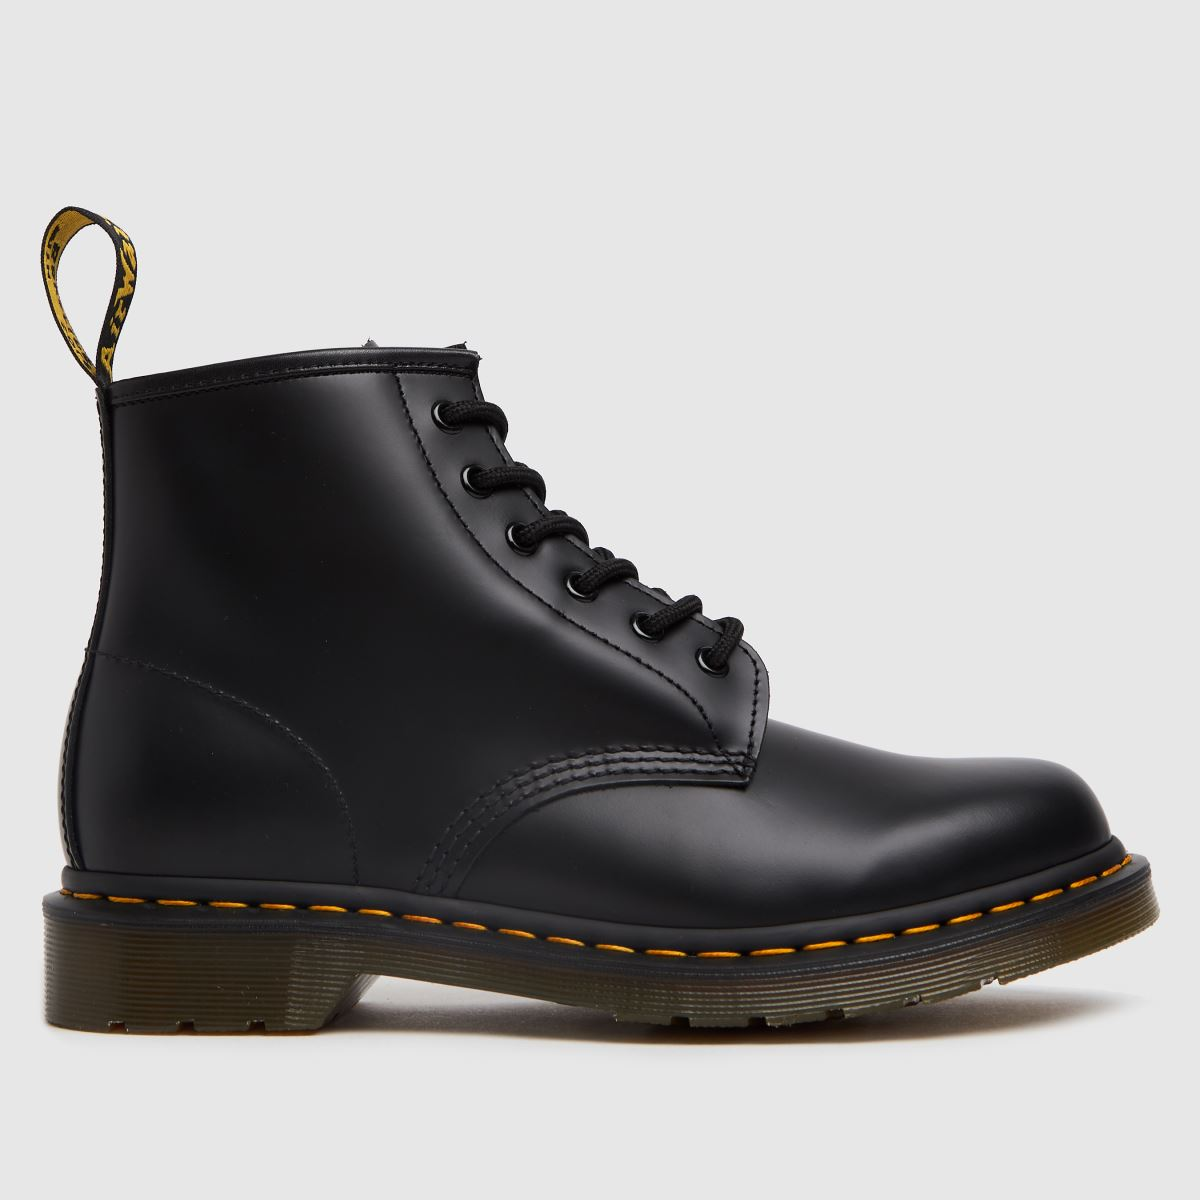 Dr Martens Black 101 Ys 6 Eye Boots